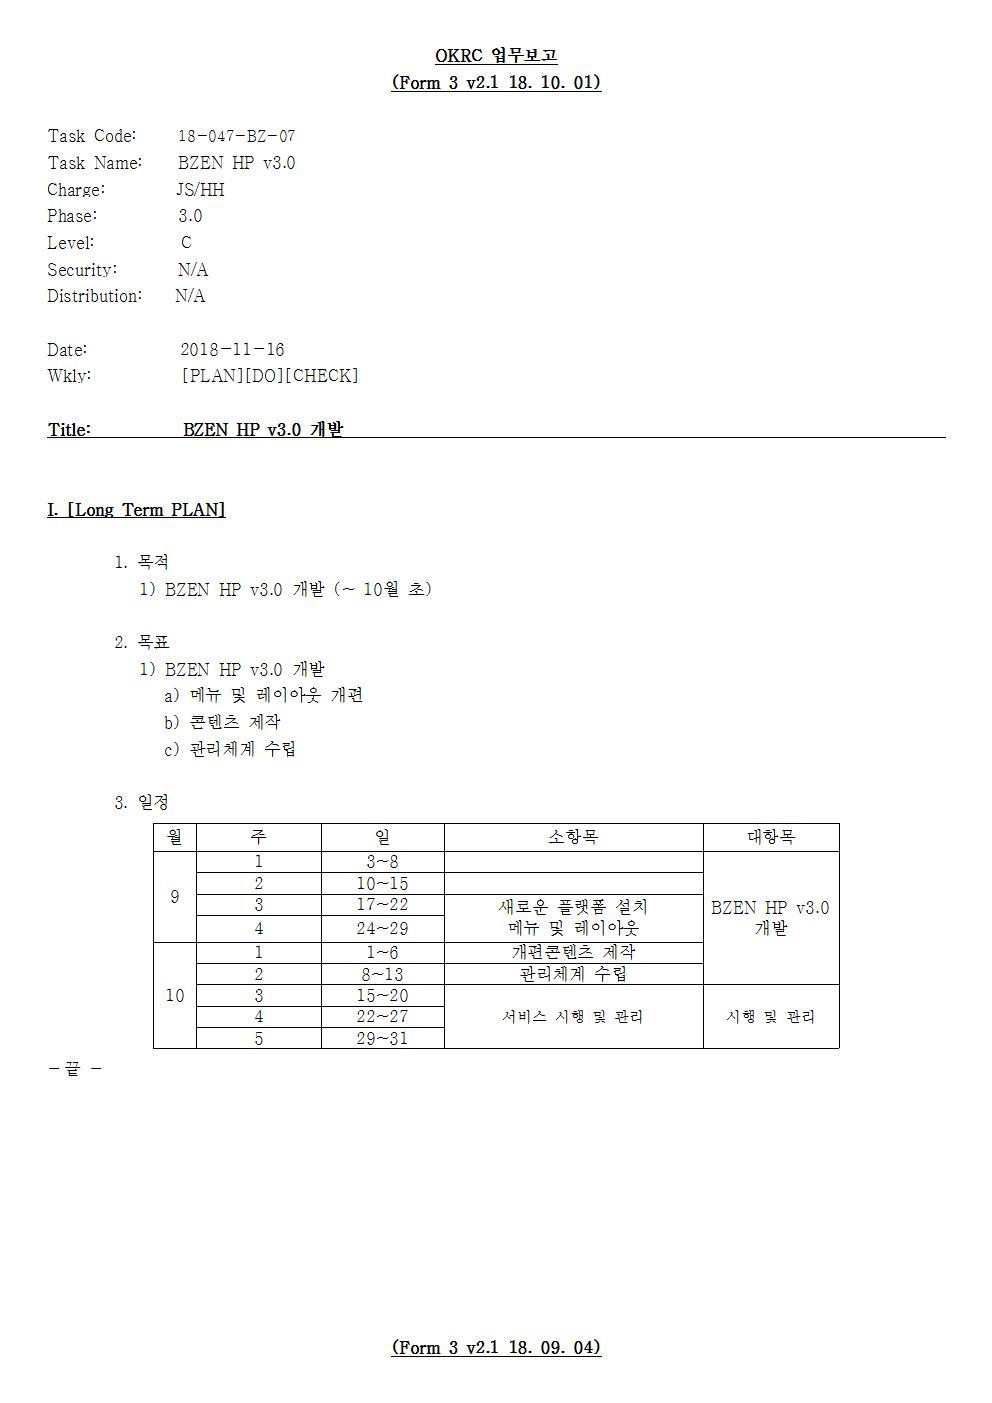 D-[18-047-BZ-07]-[BZEN HP v3.0]-[2018-11-16][HH]001.jpg